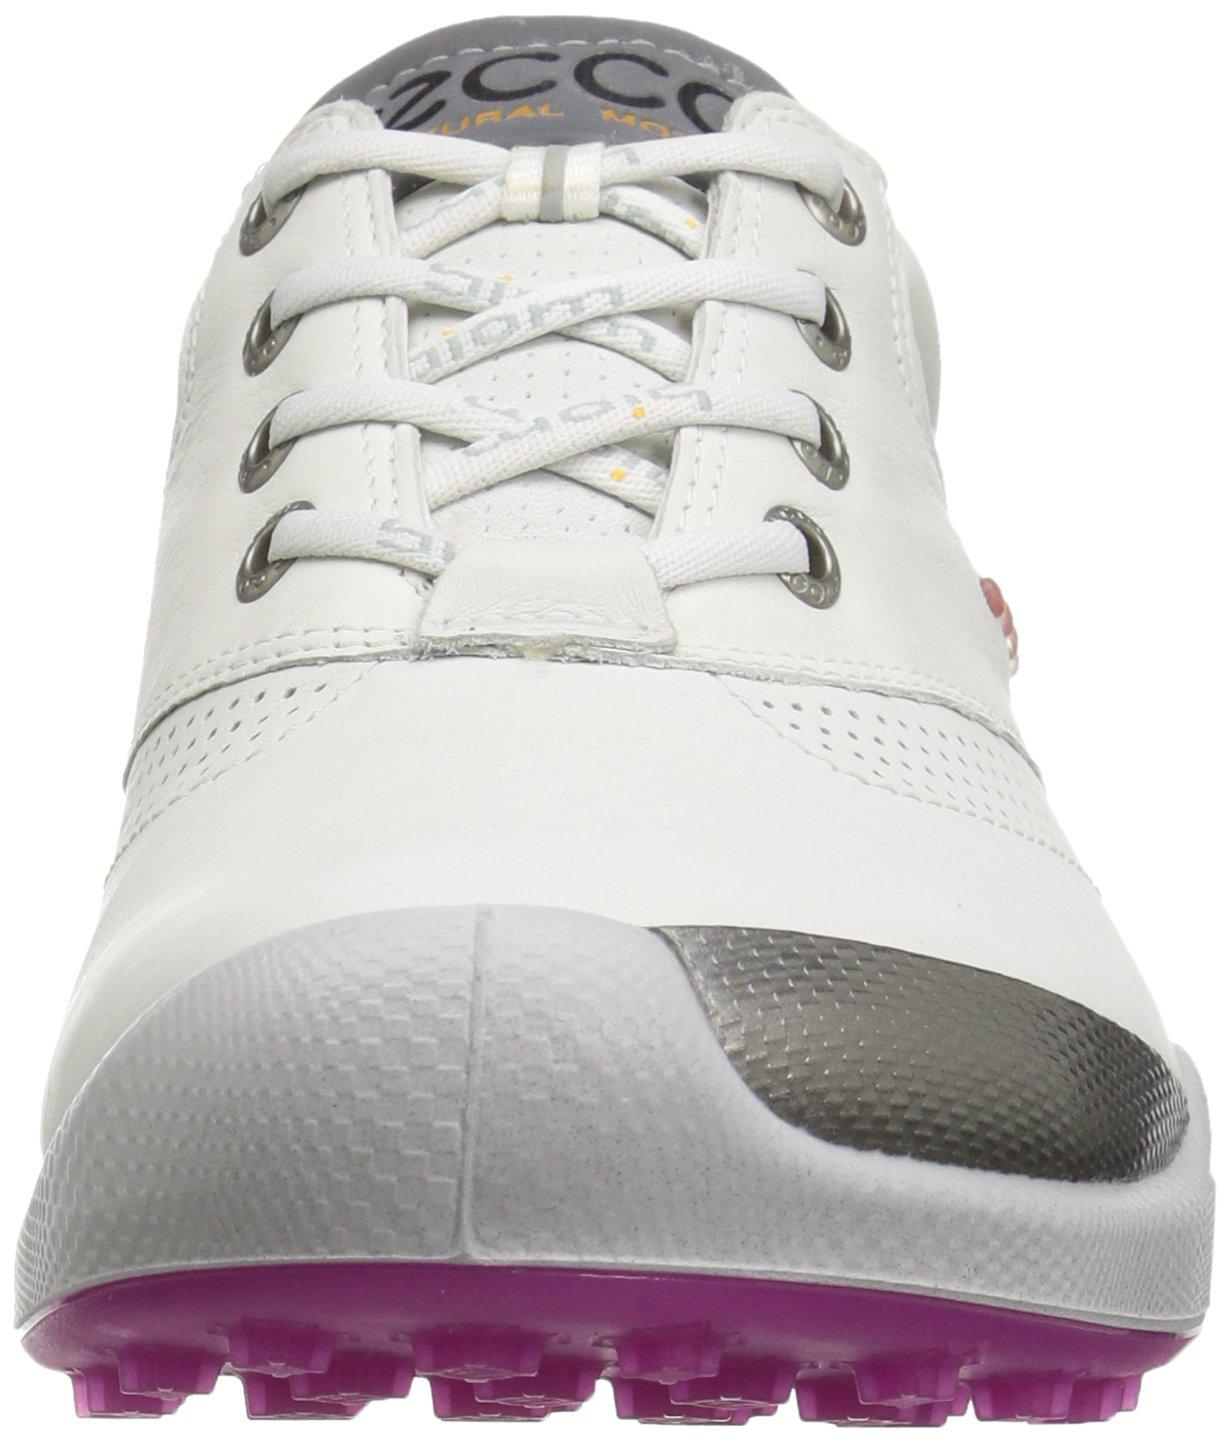 ECCO Women's Biom Hybrid Hydromax Golf Shoe, White/Candy, 39 EU/8-8.5 M US by ECCO (Image #4)